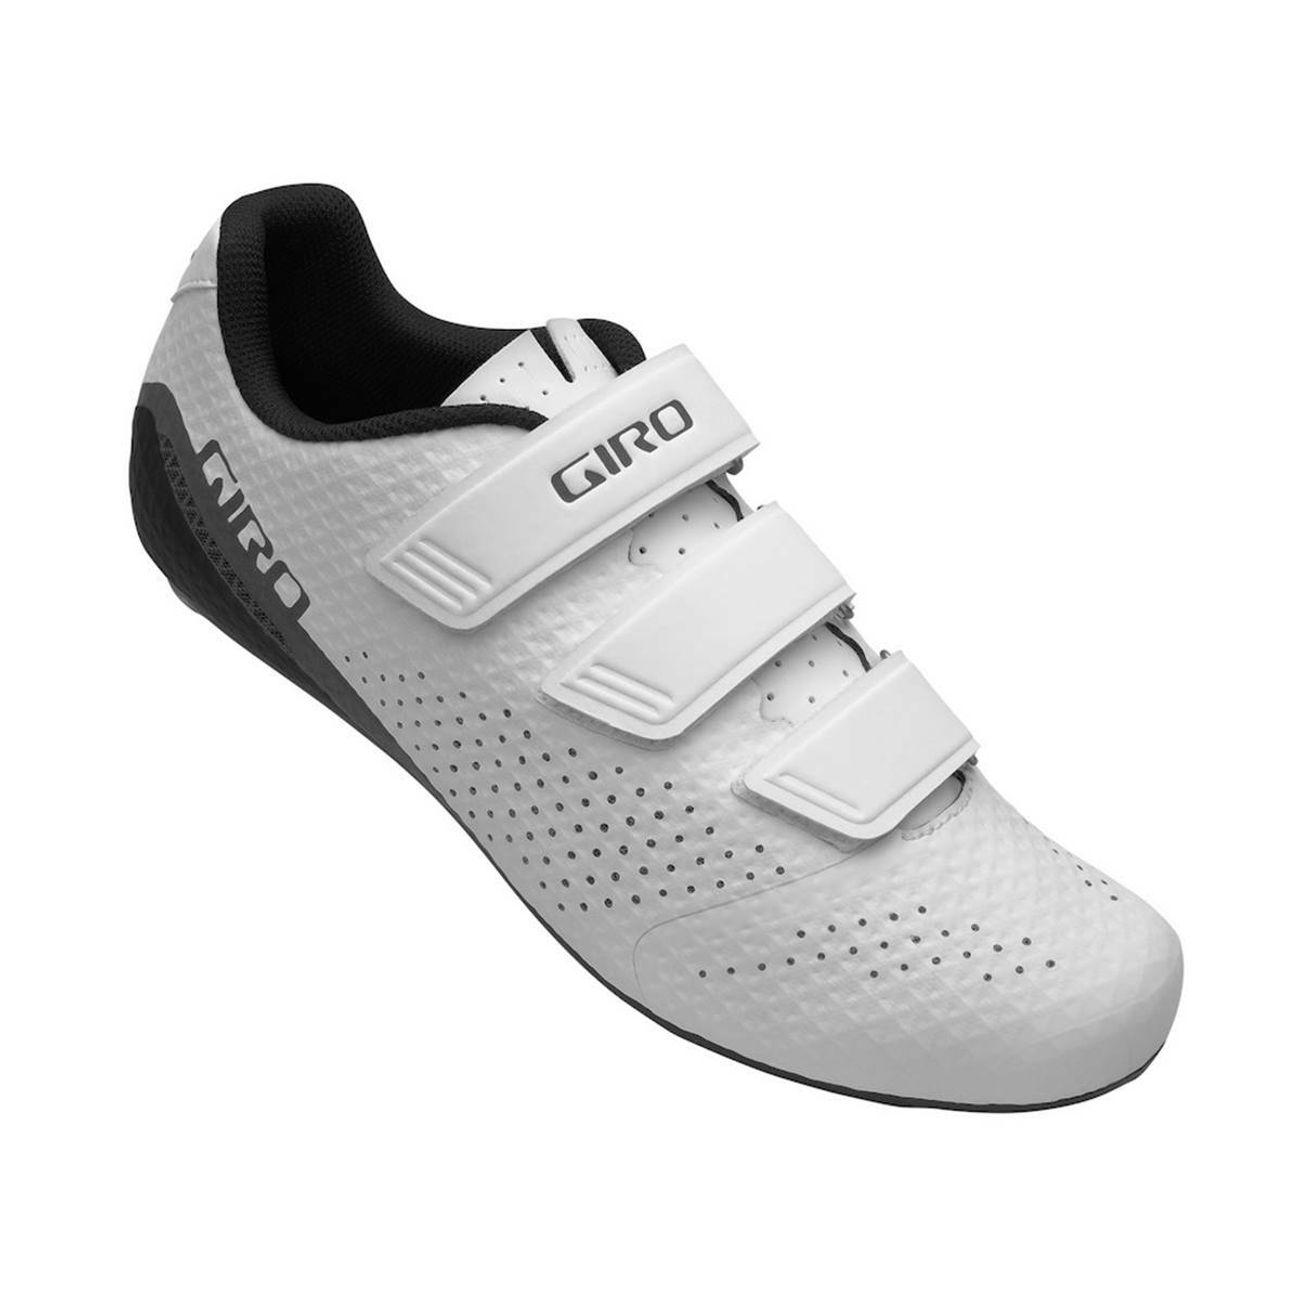 Cyclisme sur route homme GIRO Chaussures Giro Stylus